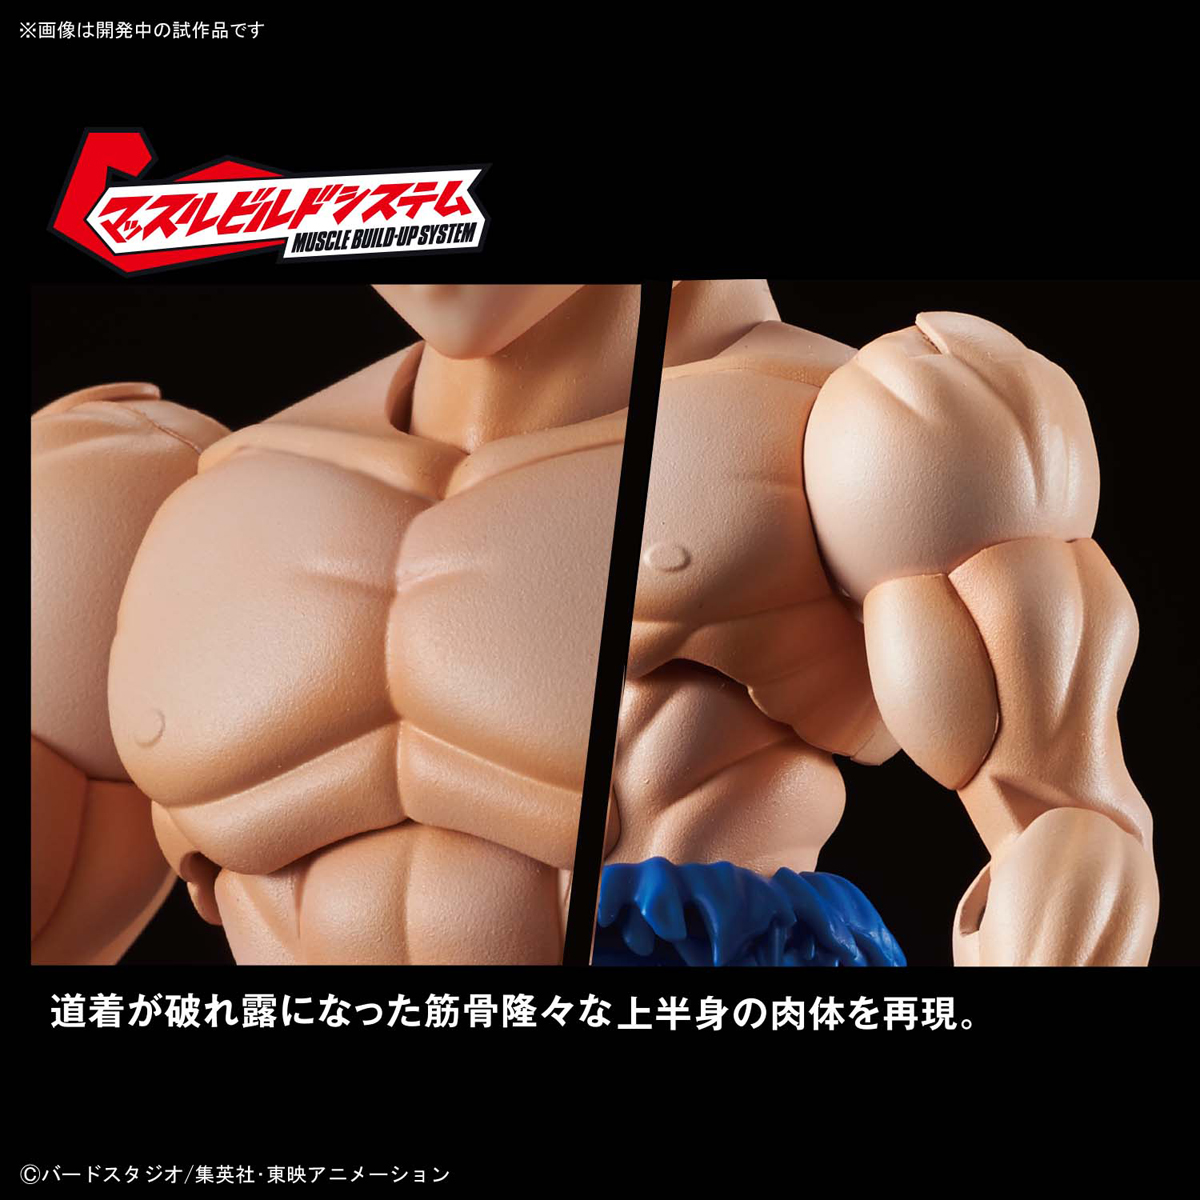 Figure-rise Standard 『ドラゴンボール超』 孫悟空(身勝手の極意) プラモデル